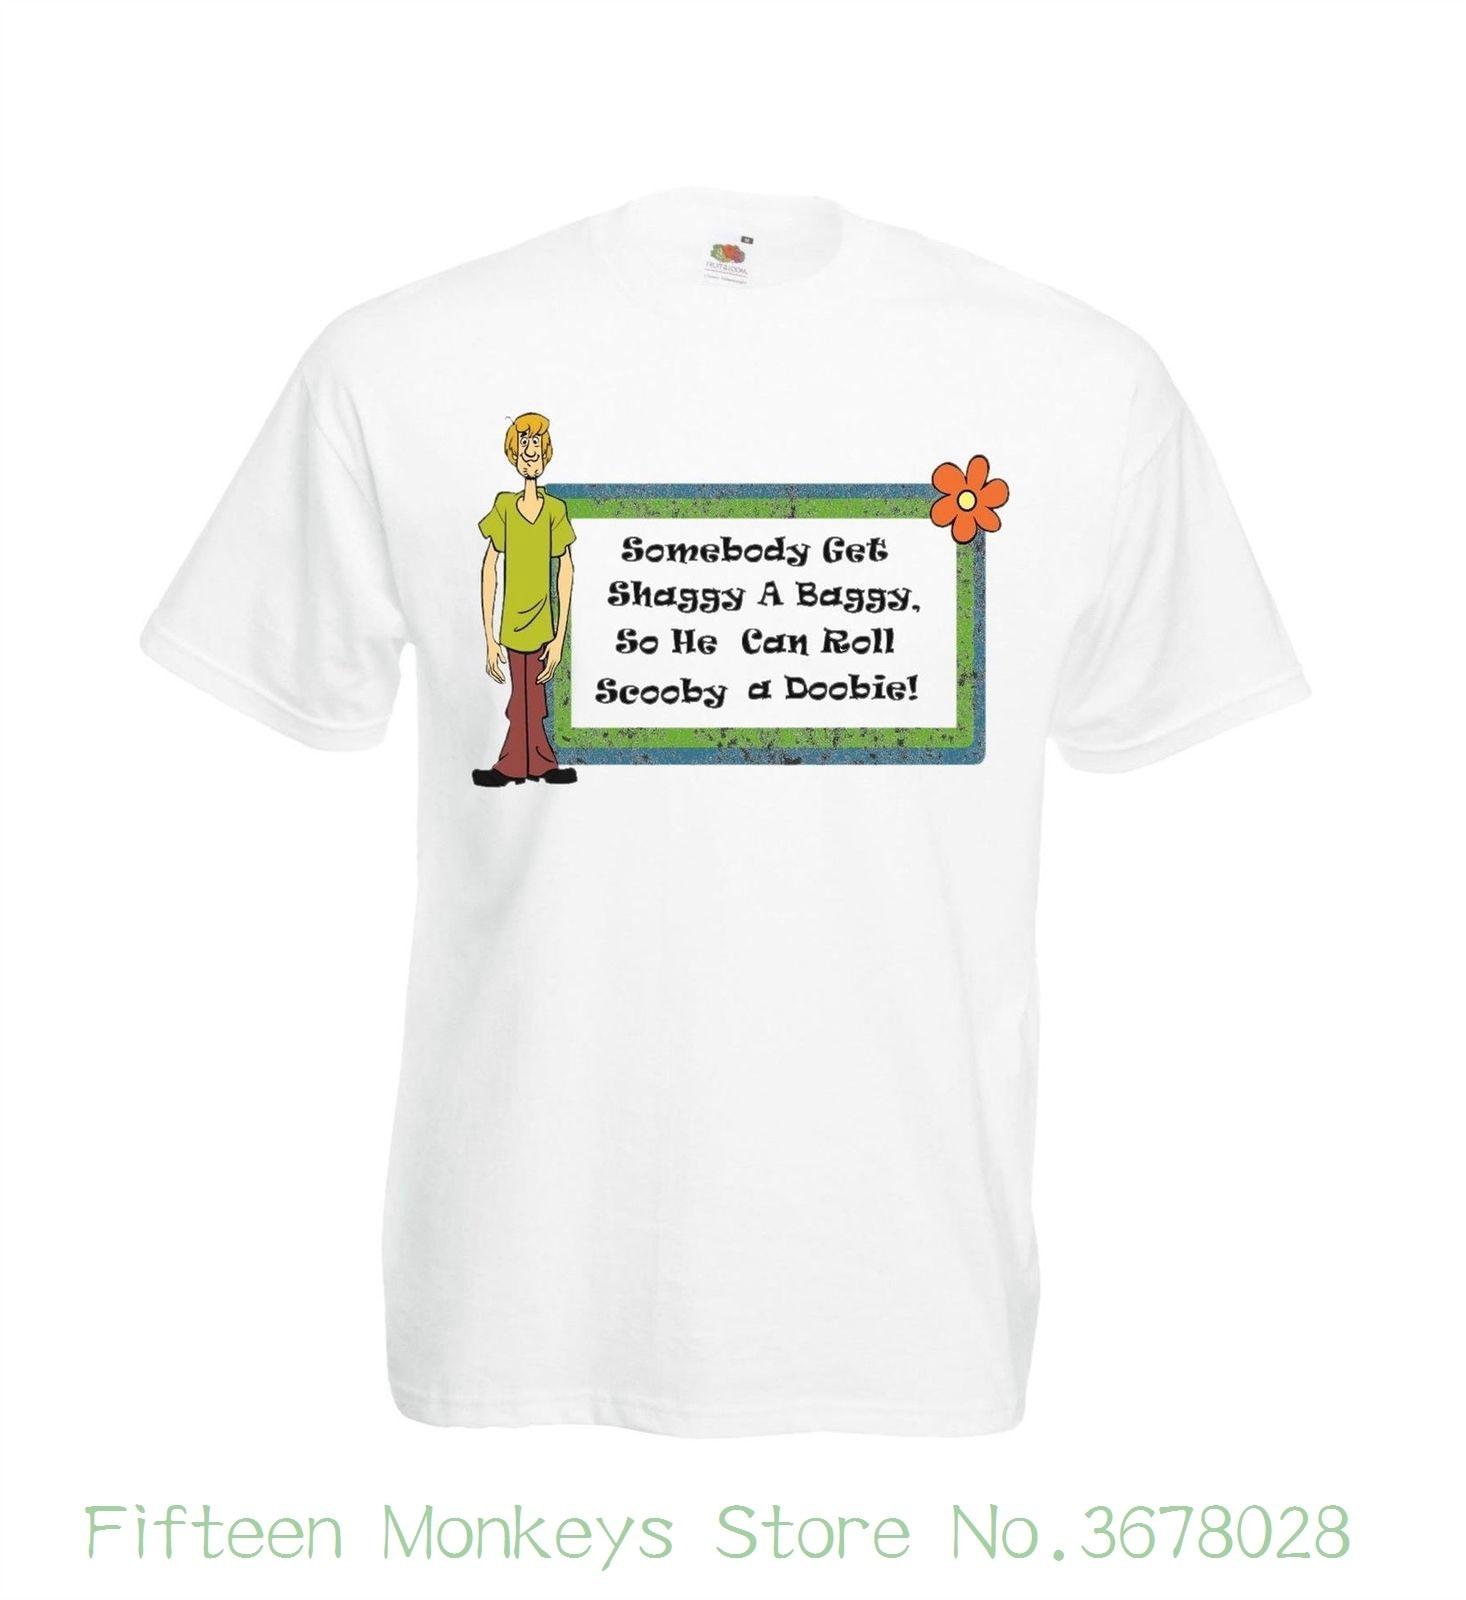 Camiseta divertida para mujer, camiseta de Scooby A Doobie, camiseta Shaggy Rogers Stoner 420 Weed, camiseta de estilo coreano Harajuku para Festival